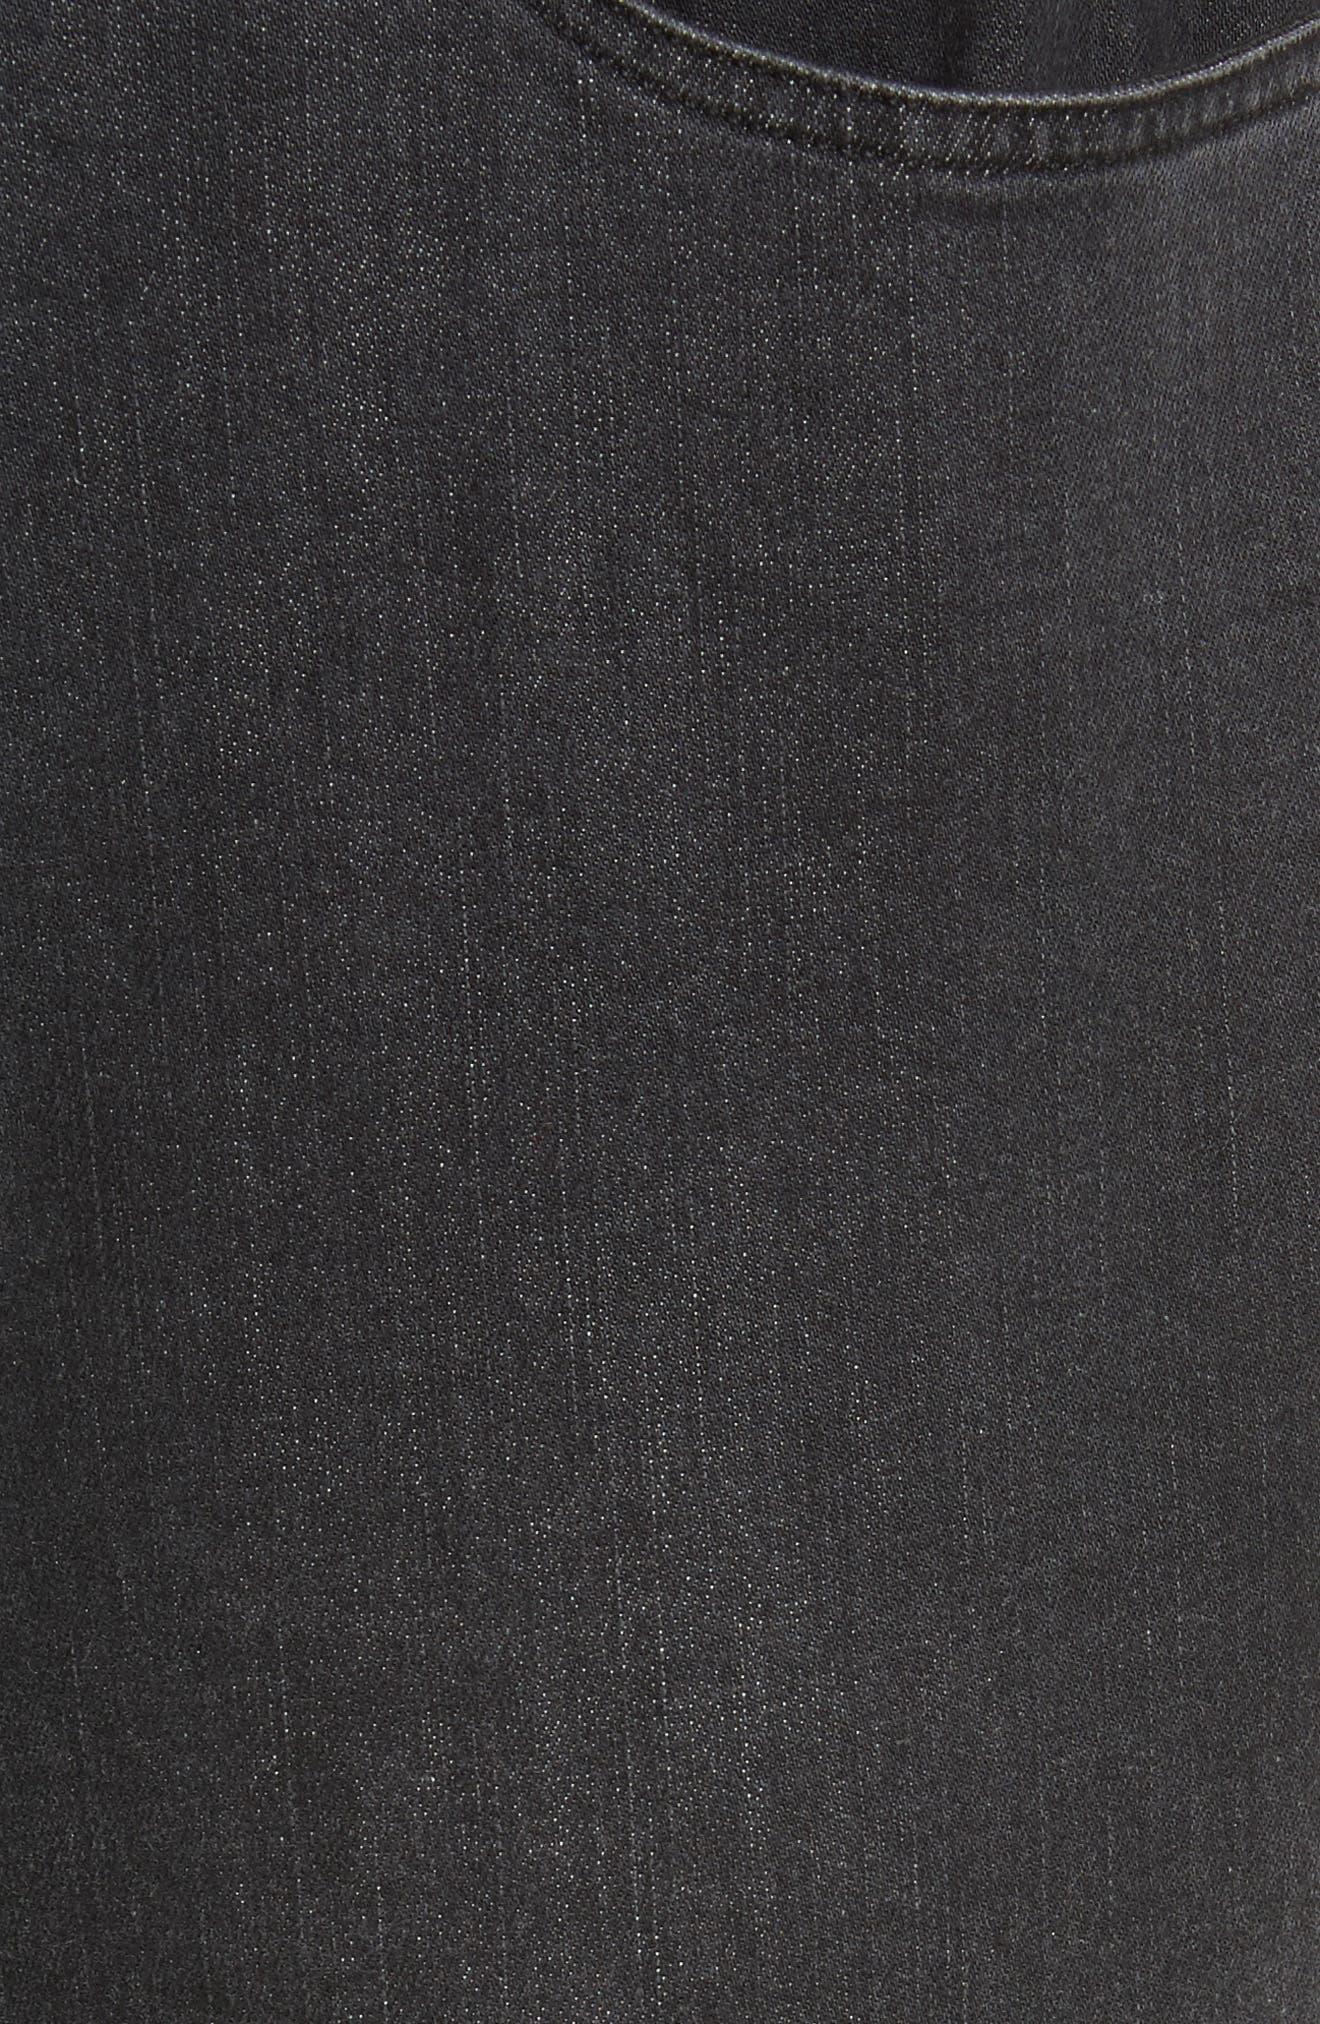 High Waist Slim Jeans,                             Alternate thumbnail 5, color,                             002